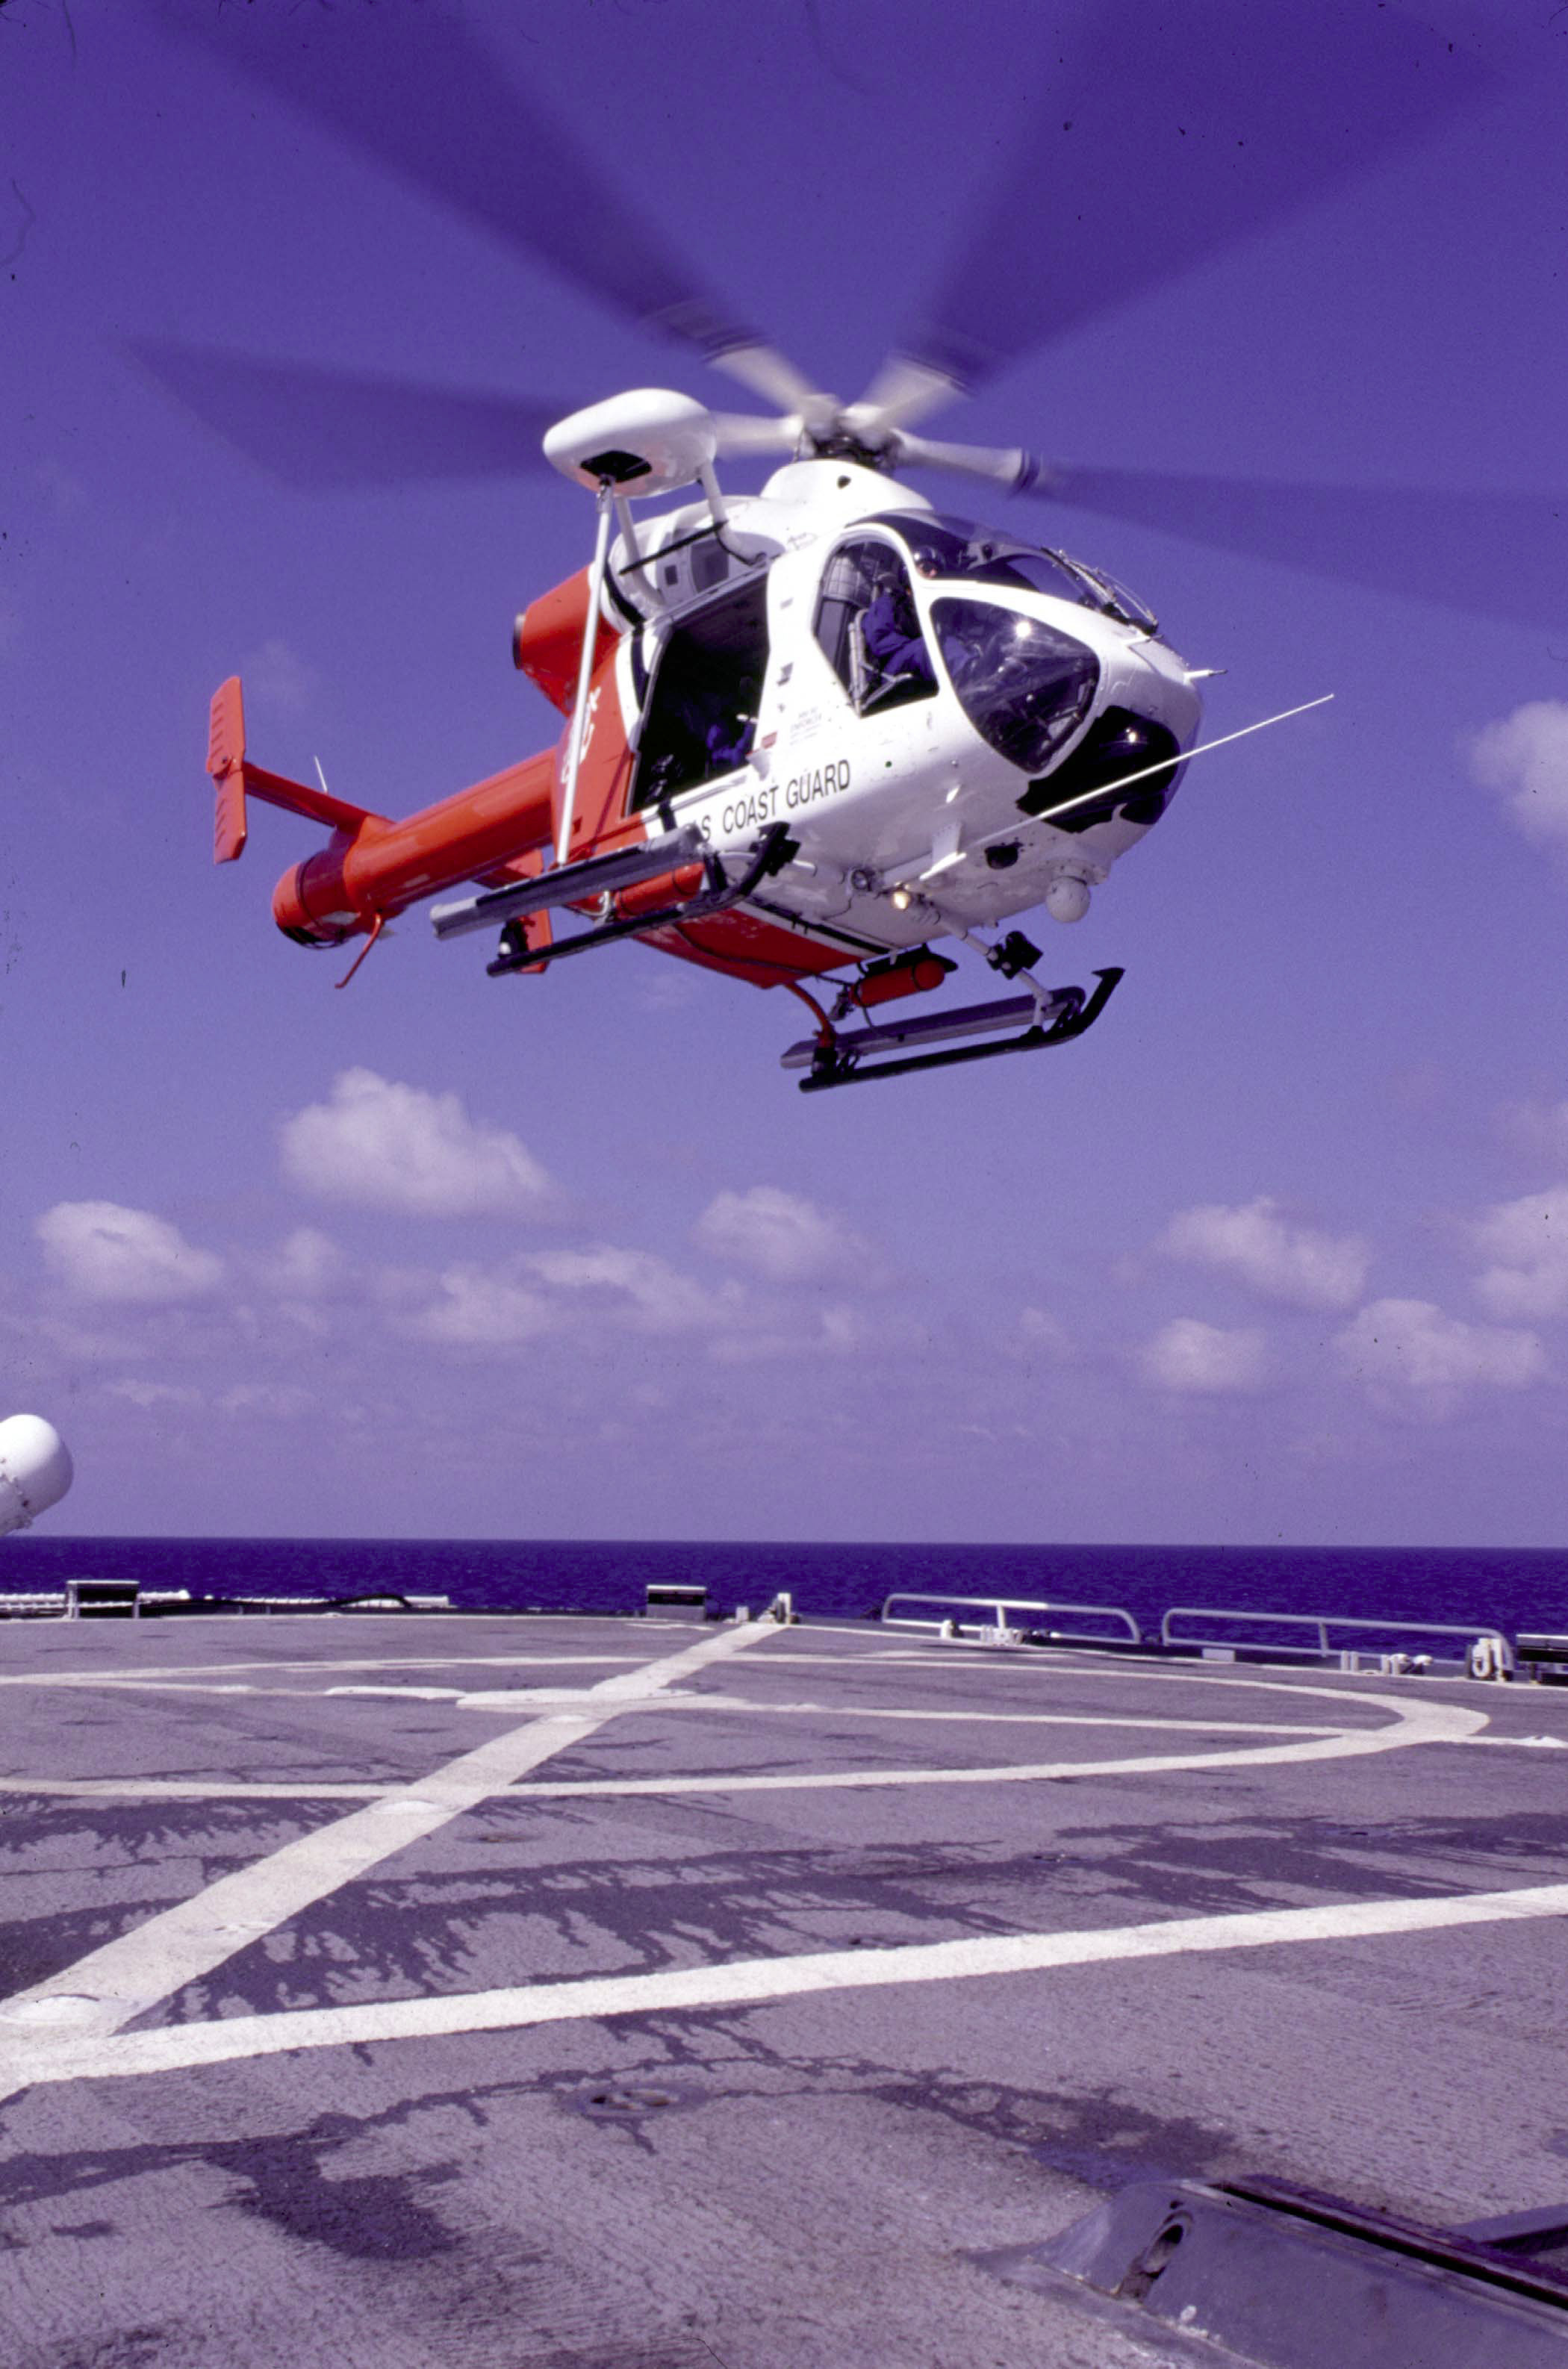 File:MH90 ENFORCER HELICOPTER DVIDS1079970.jpg